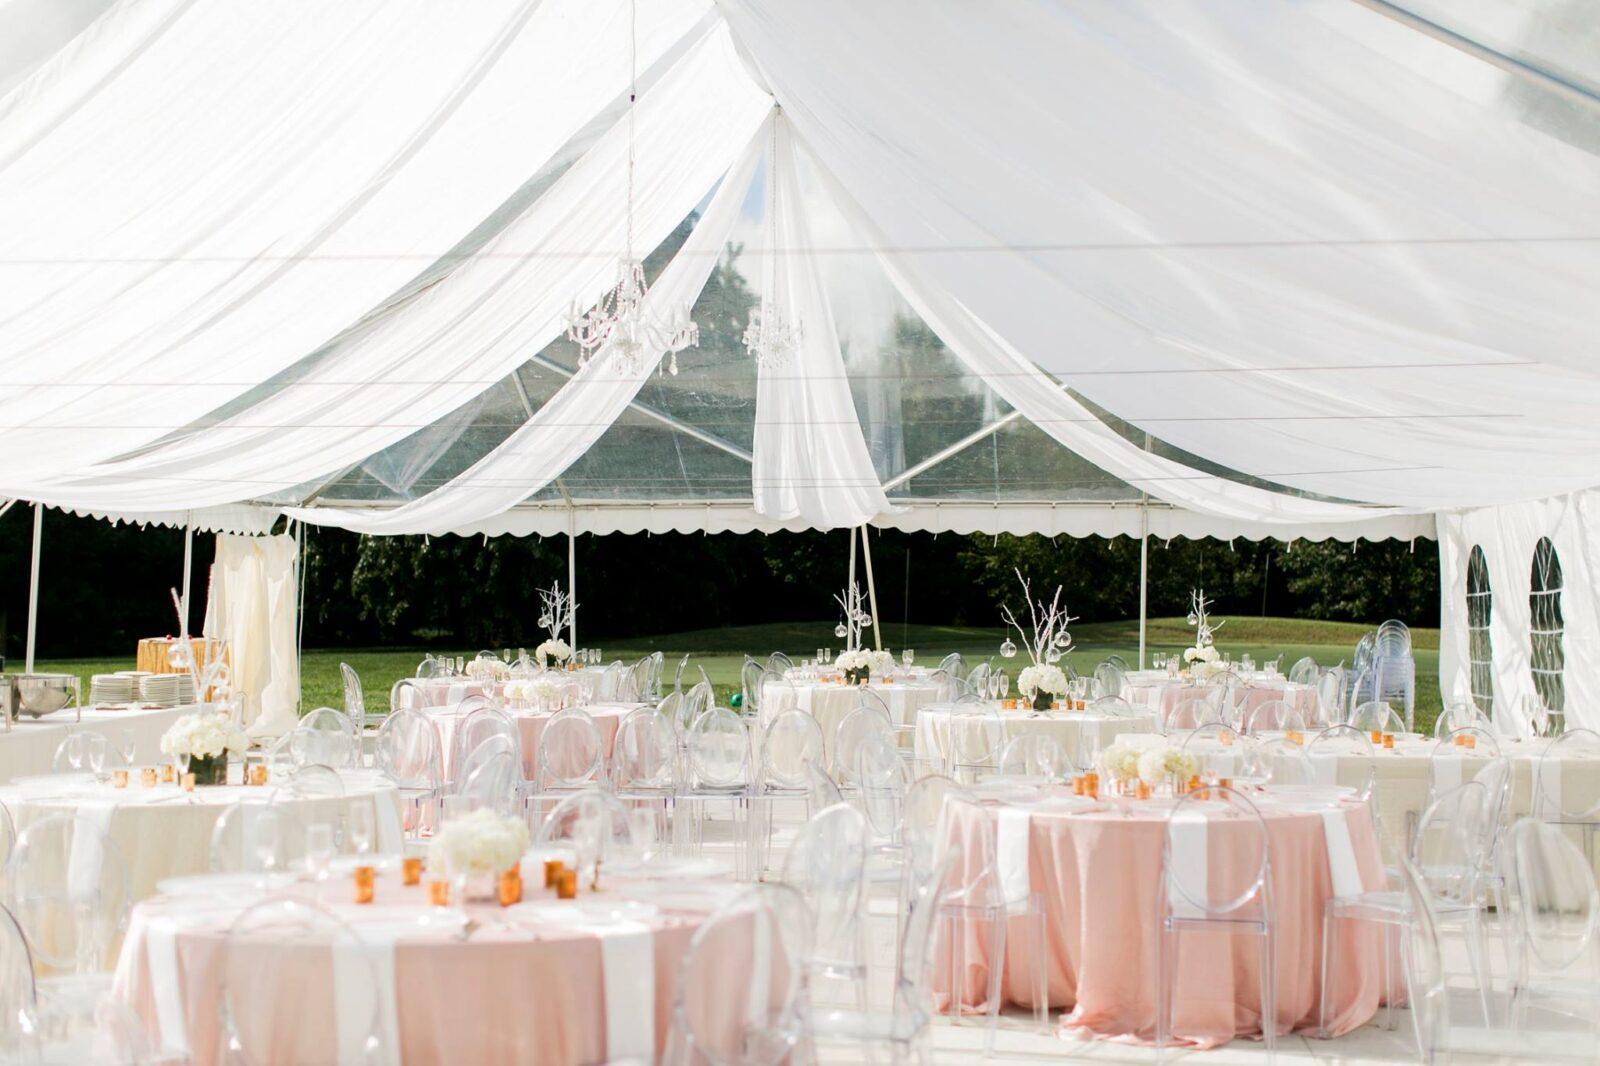 haseltine drape tent